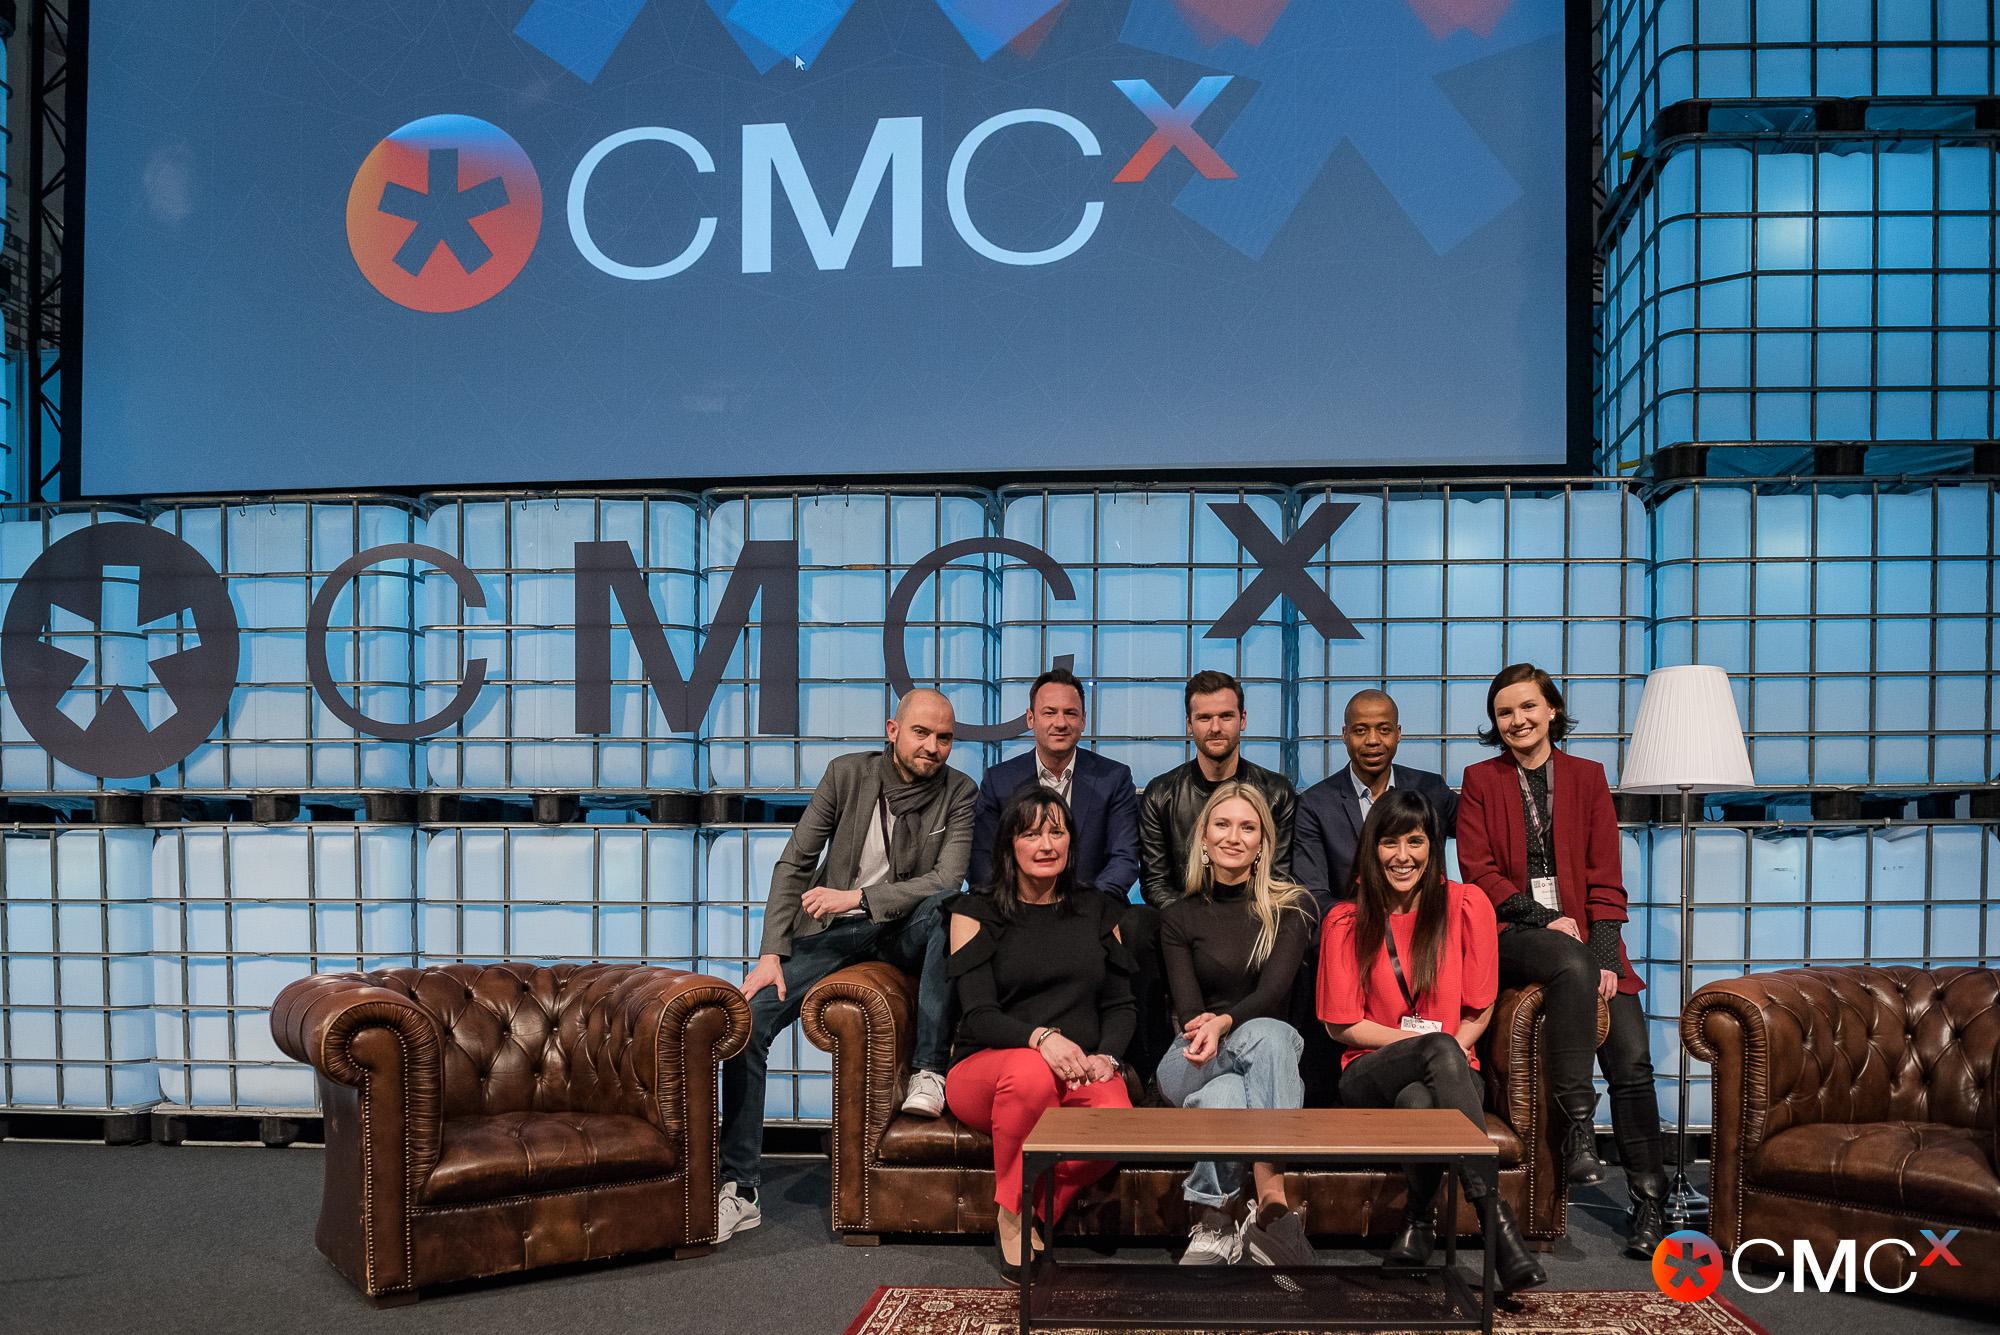 CMCX-Glasperlenspiel-Sony-EnviaM